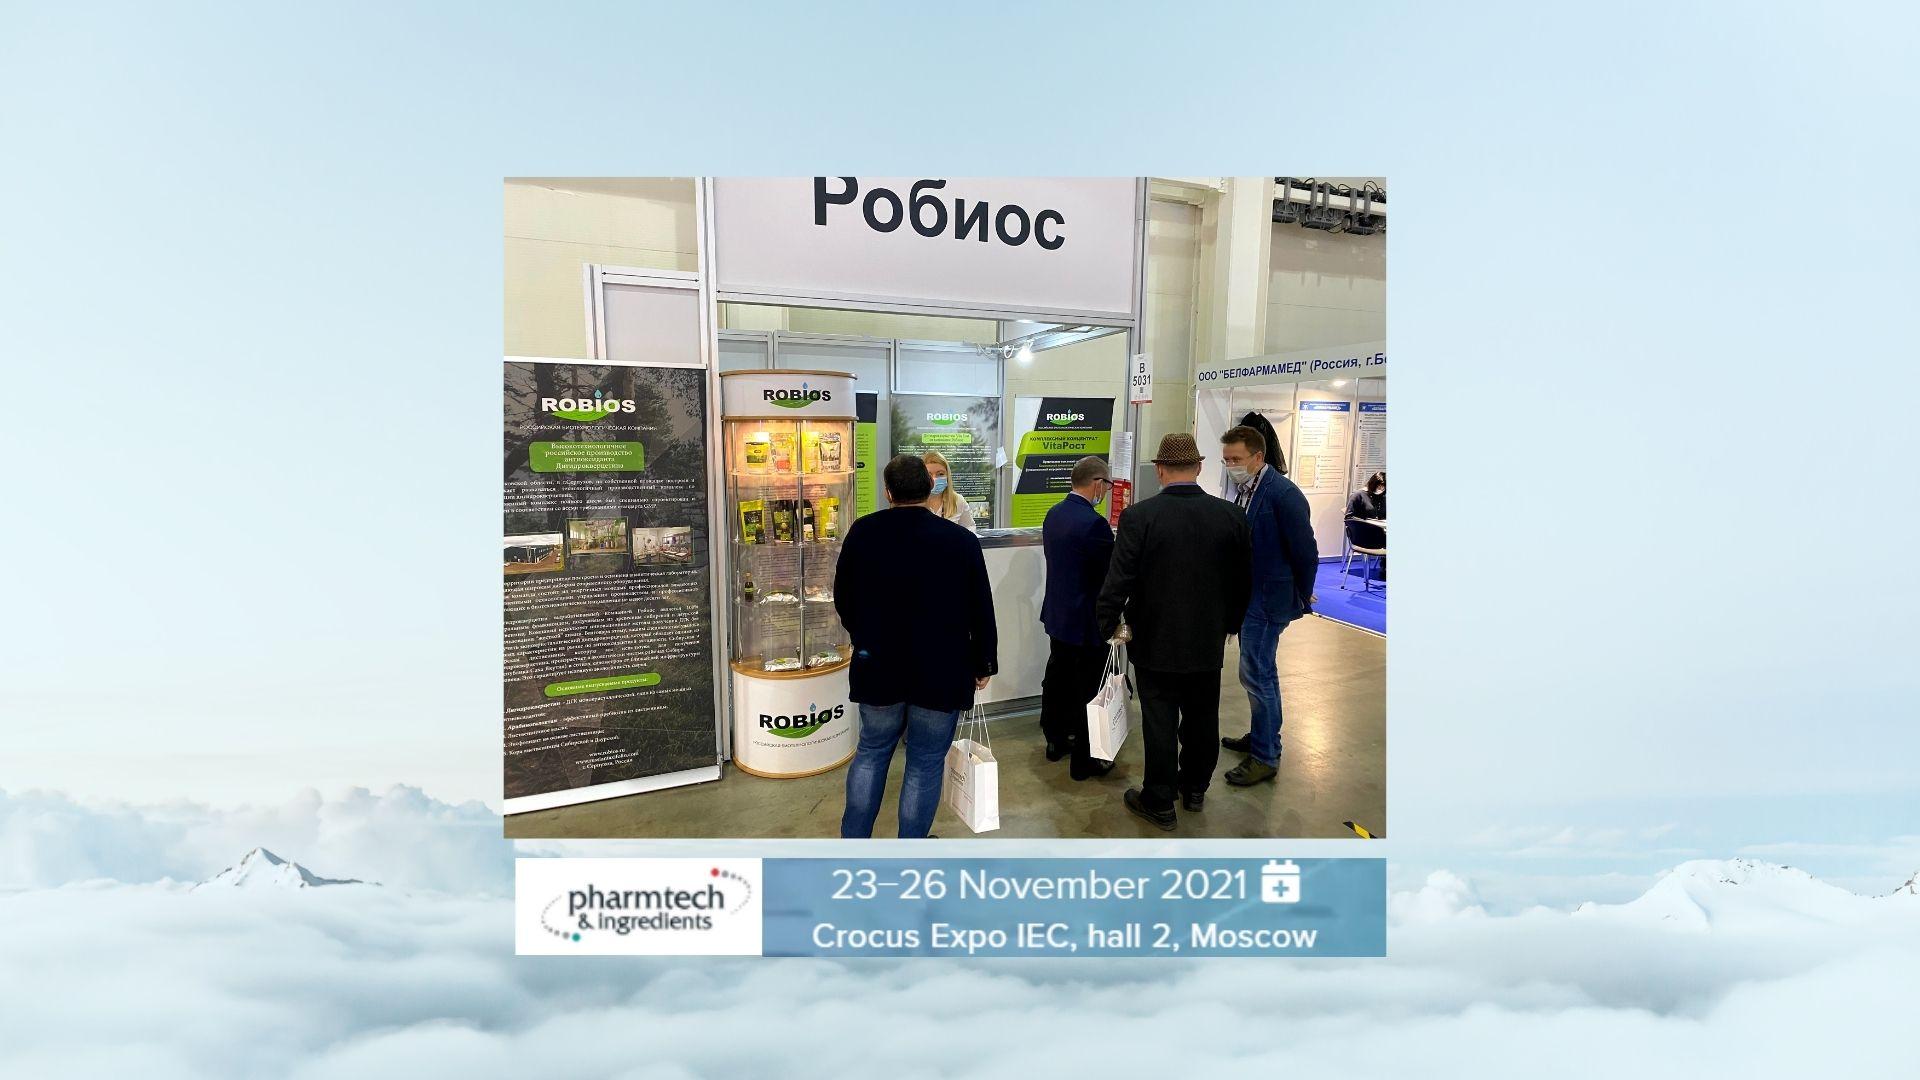 Robios Pharmatech 2020